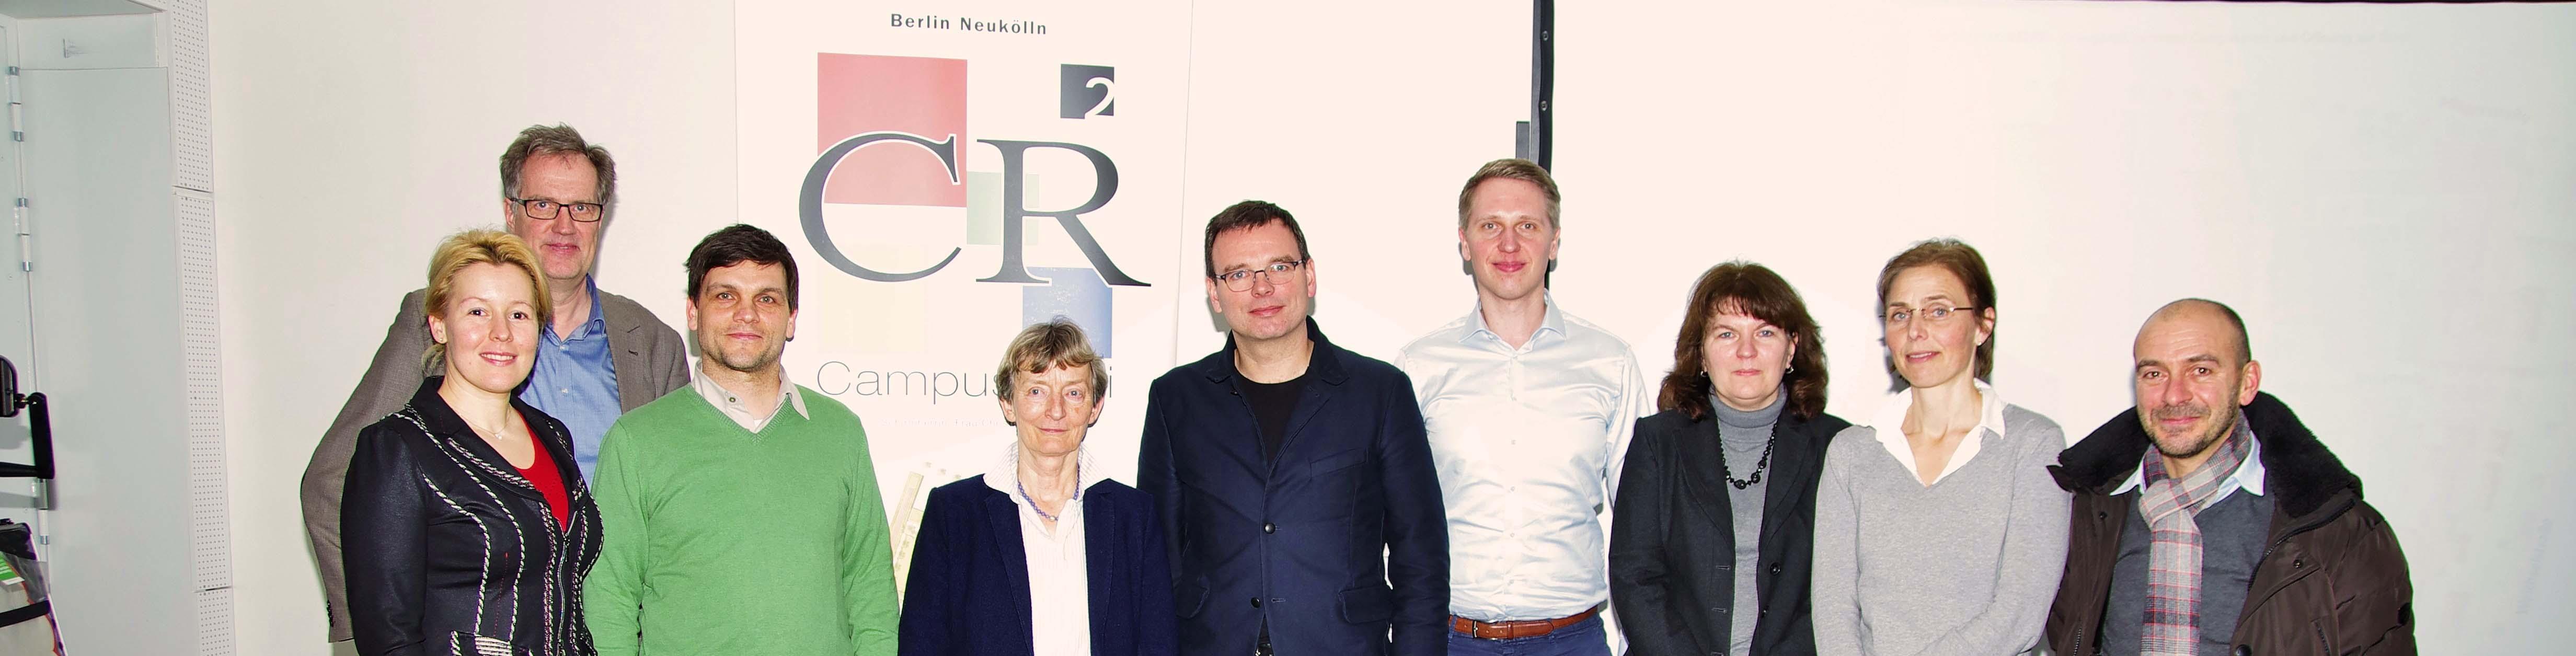 Foto: Simon | v.l.: Fr. Dr. Giffey, Hr. Bläsing, Hr. Dr. Rostalski, Fr. Wolter, Hr. Schulz, Hr. Hanke, Fr. Neuhaus, Fr. Grotewal, Hr. Bernard